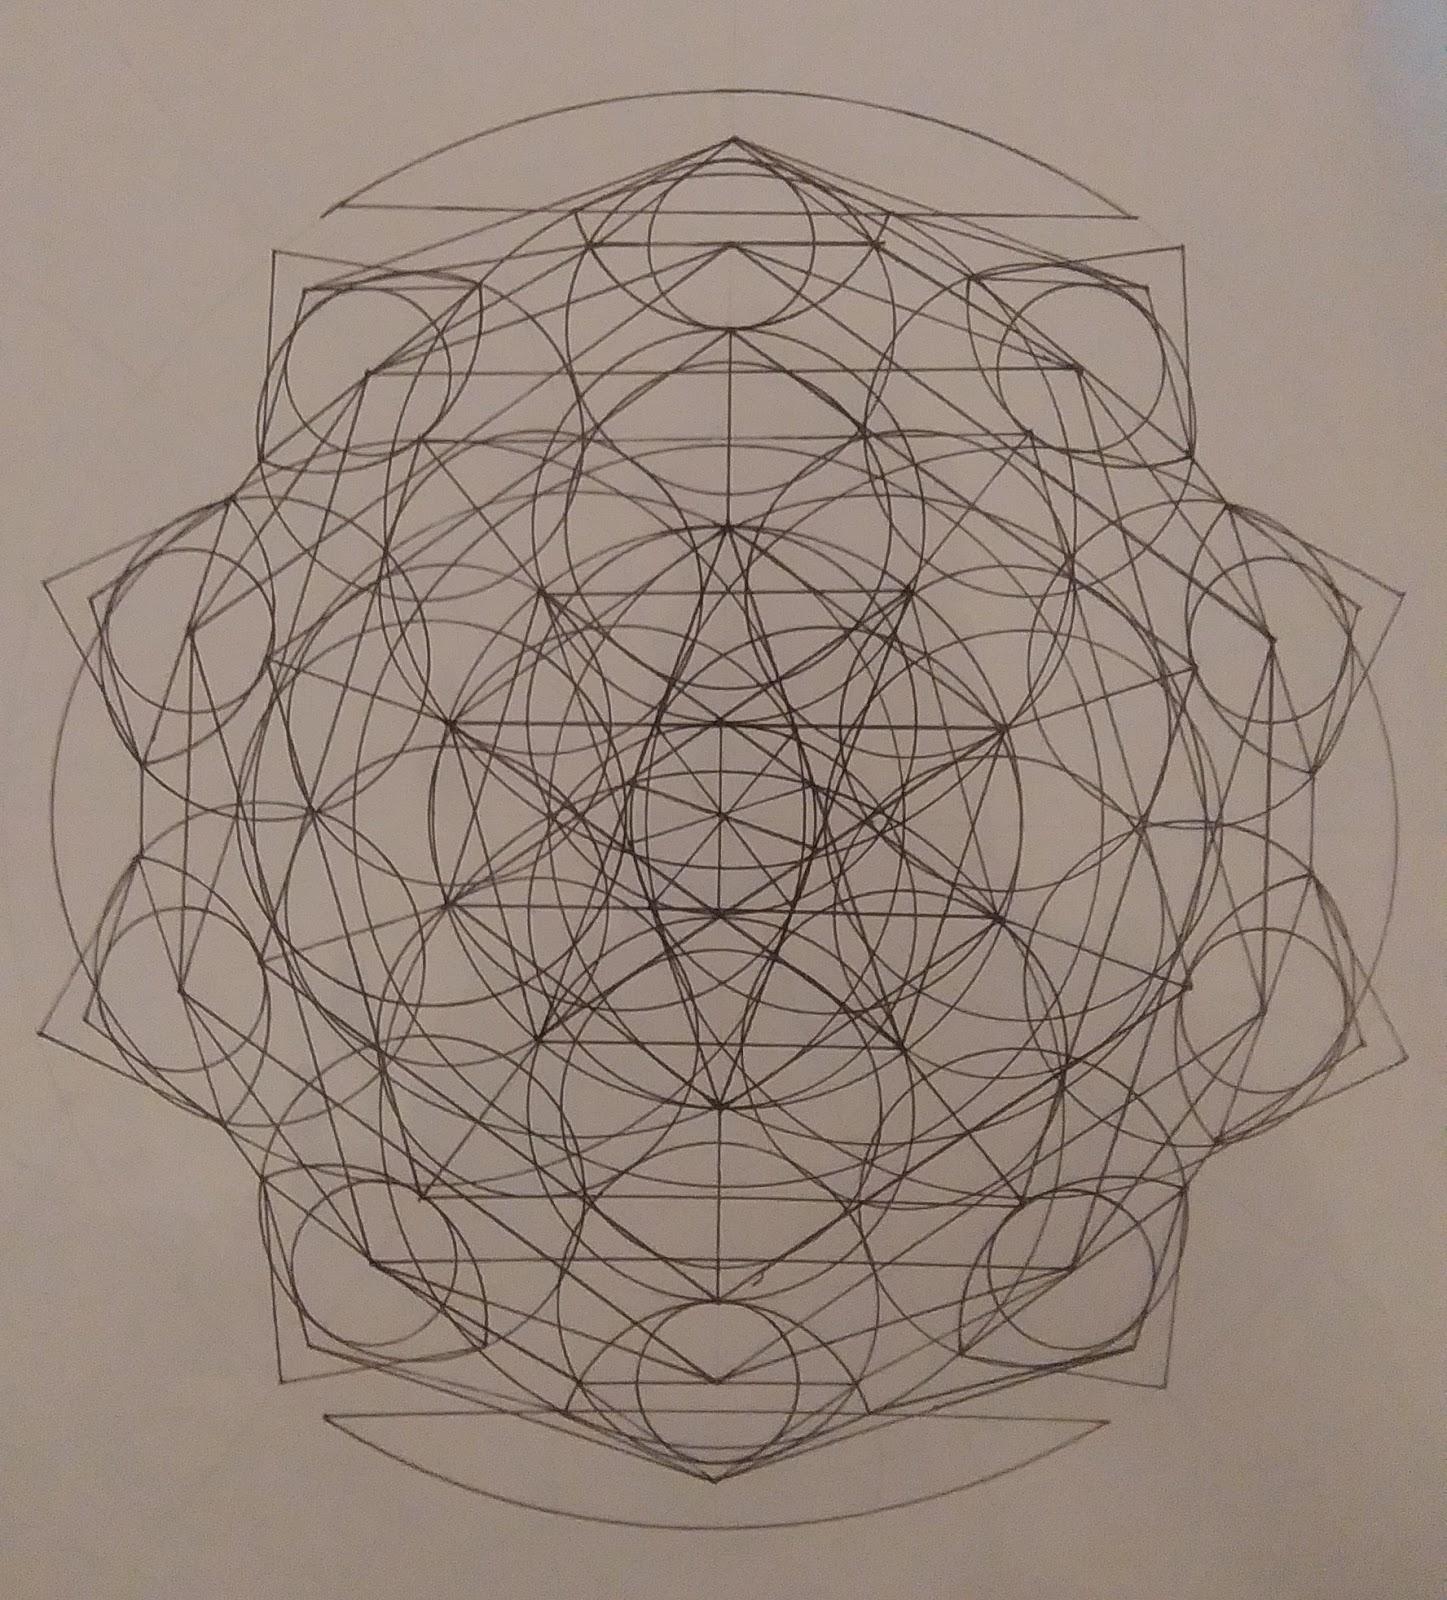 [SPOLYK] - Geometries & sketches - Page 6 48209152_1103195366533813_2573960852382154752_o